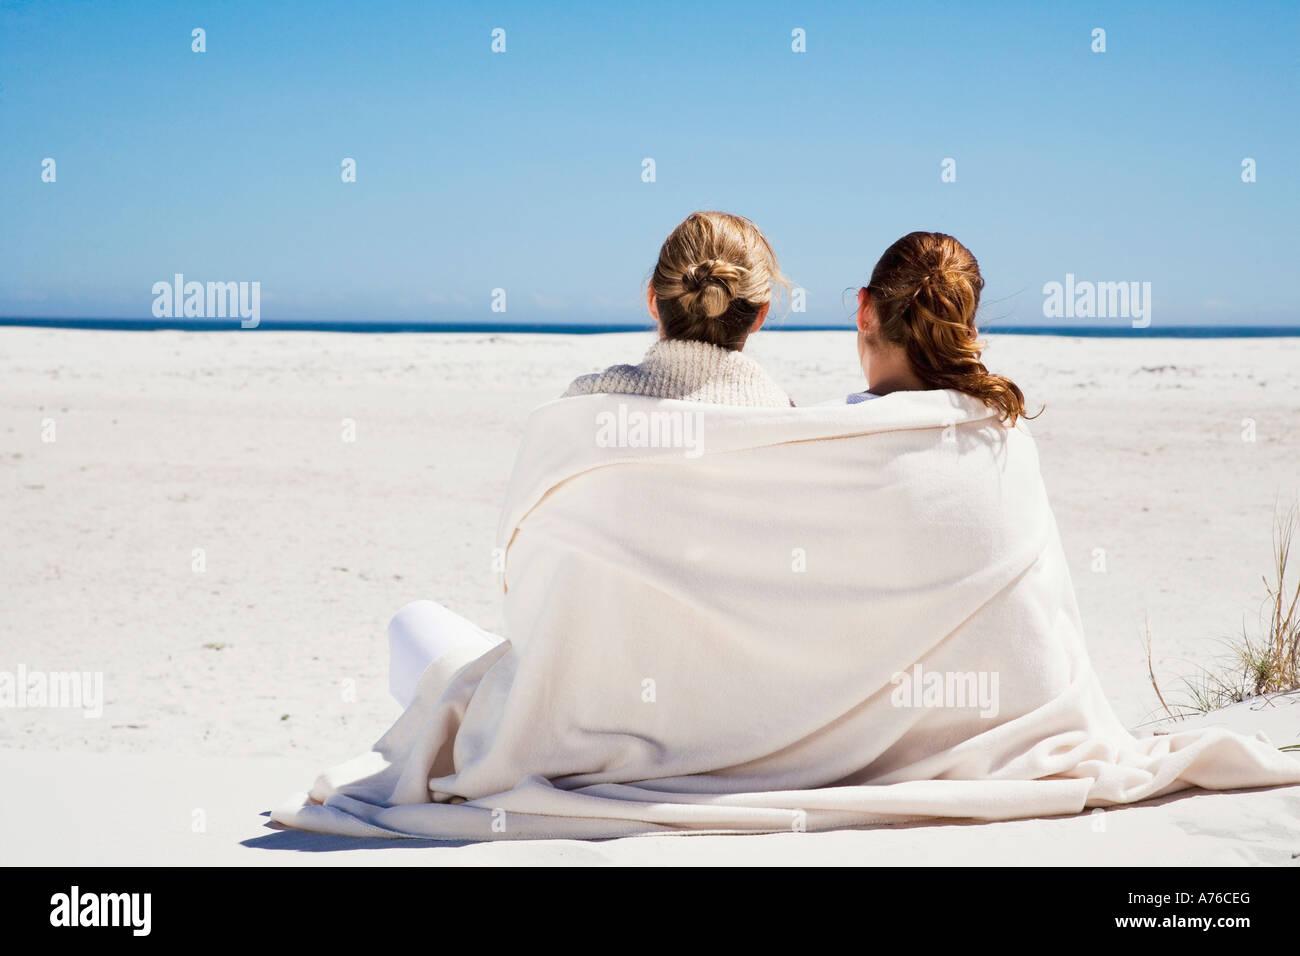 Madre e hija sentado en la playa, vista trasera Imagen De Stock